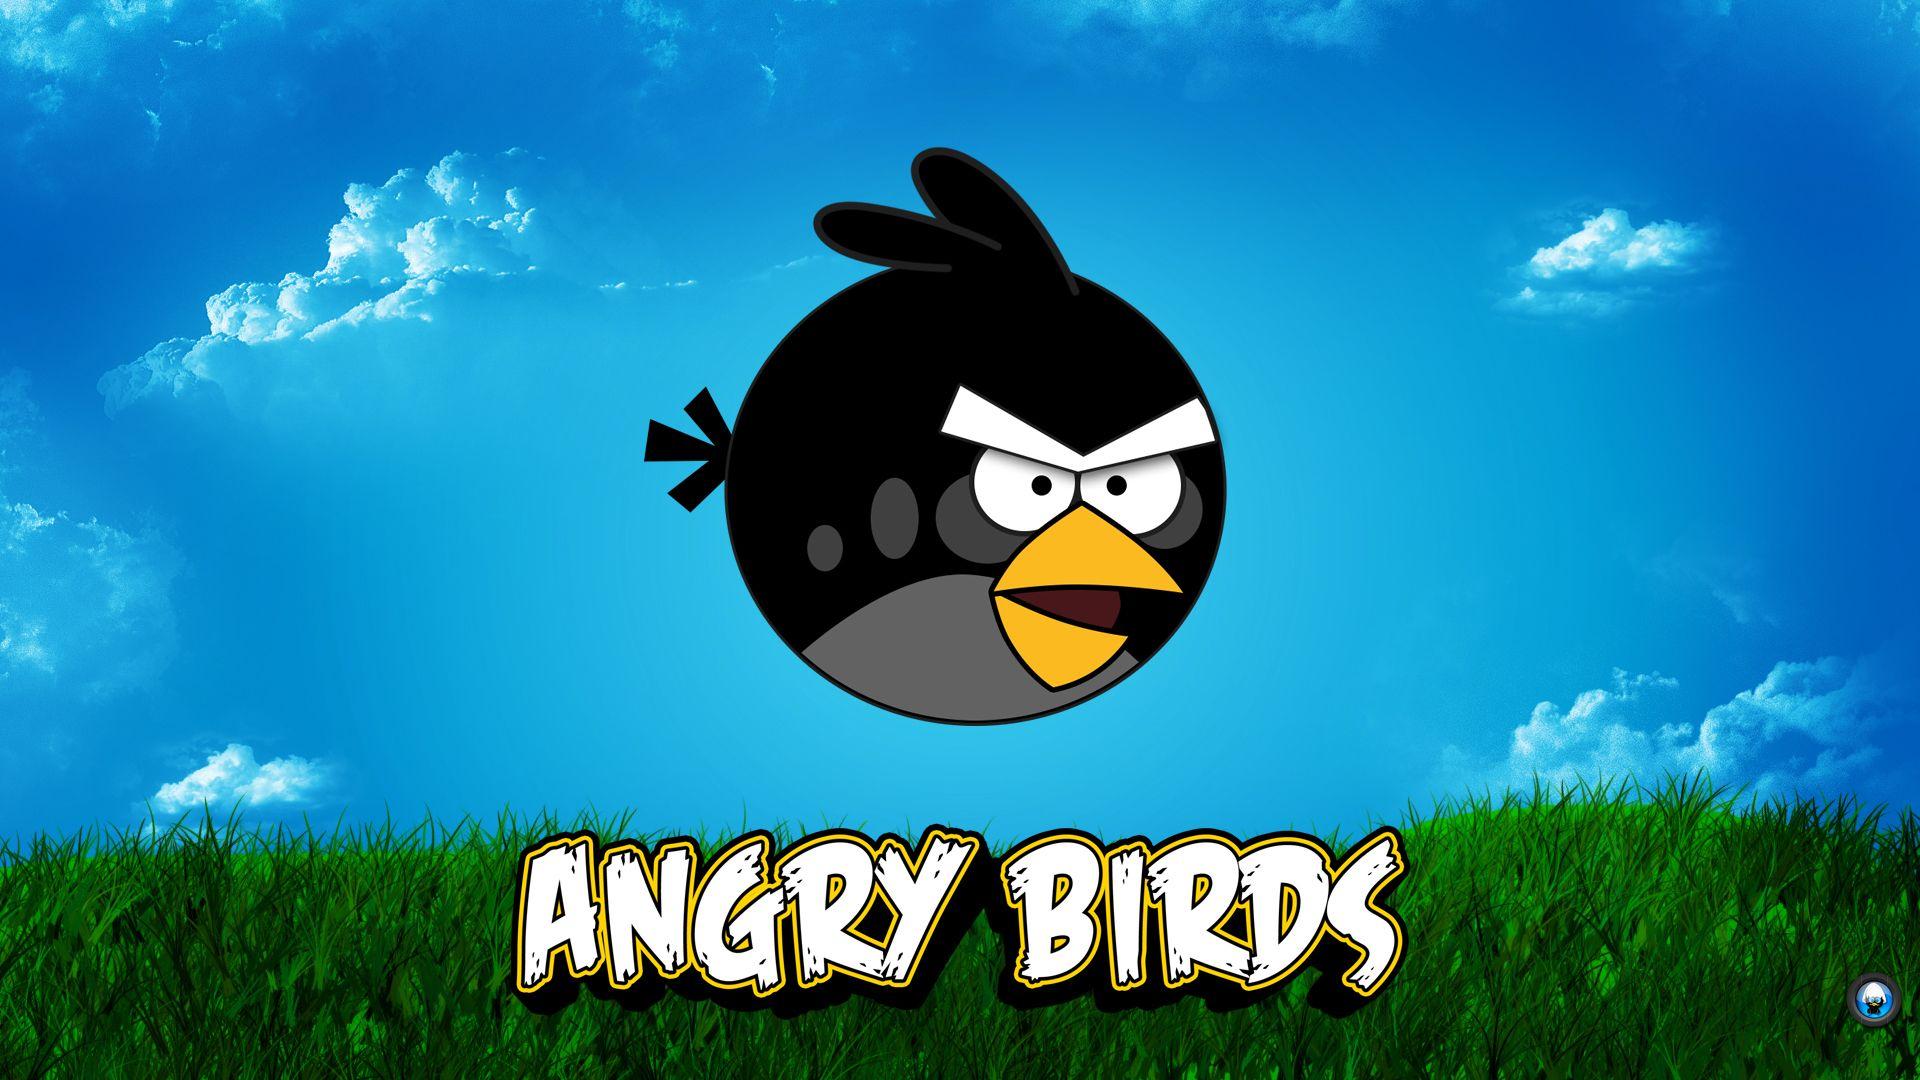 Angry Birds - Black version wallpaper 1920x1080 (1 ...